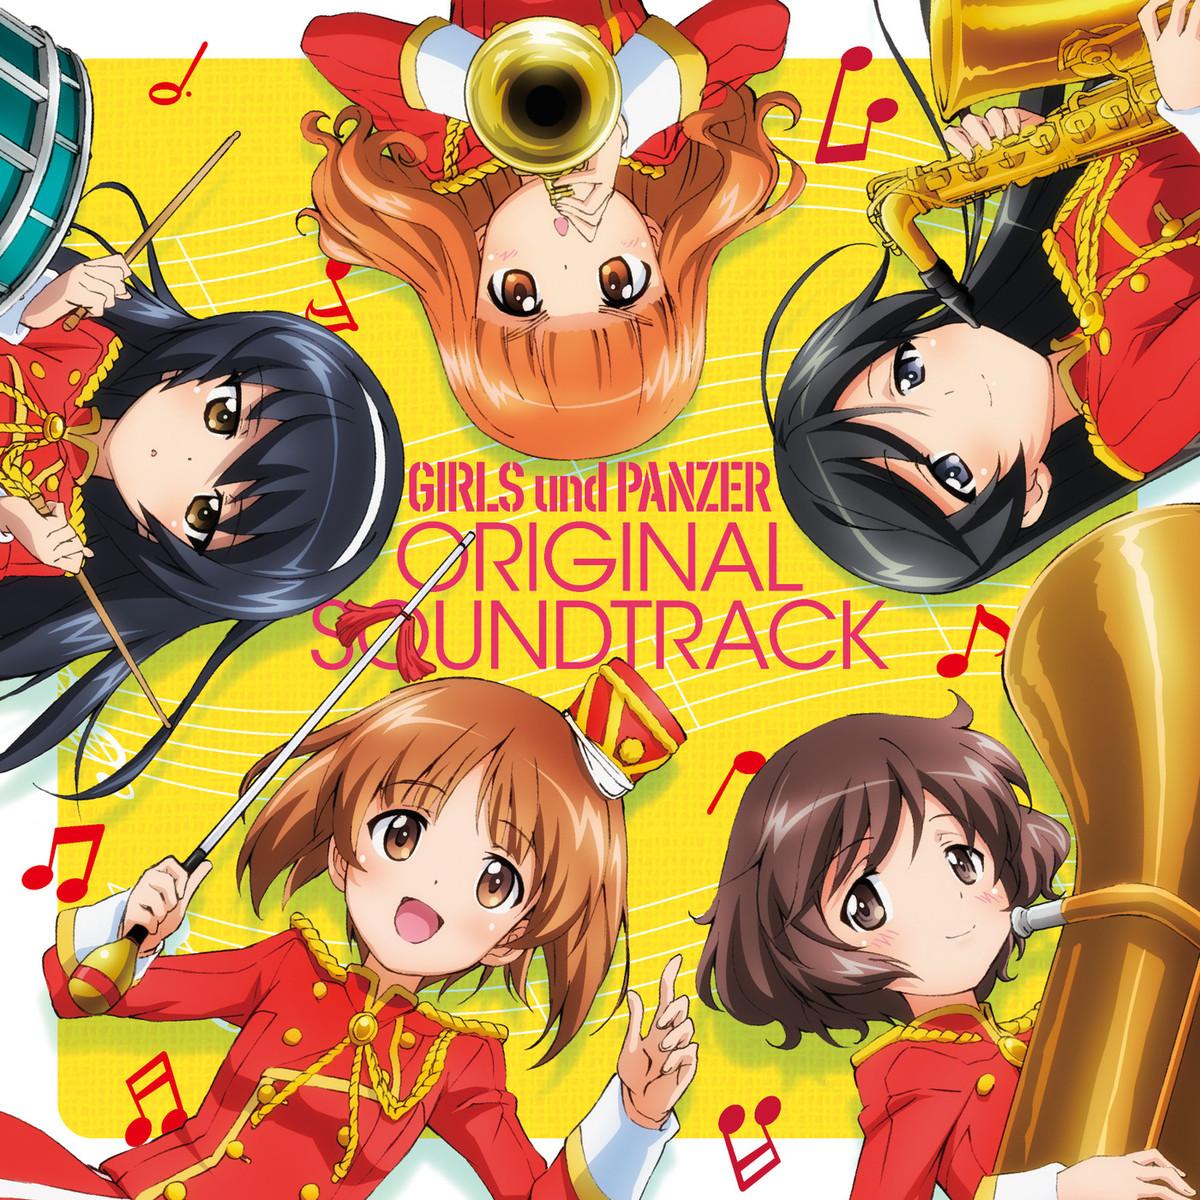 Girls und Panzer Original Soundtrack - Review - Anime Instrumentality